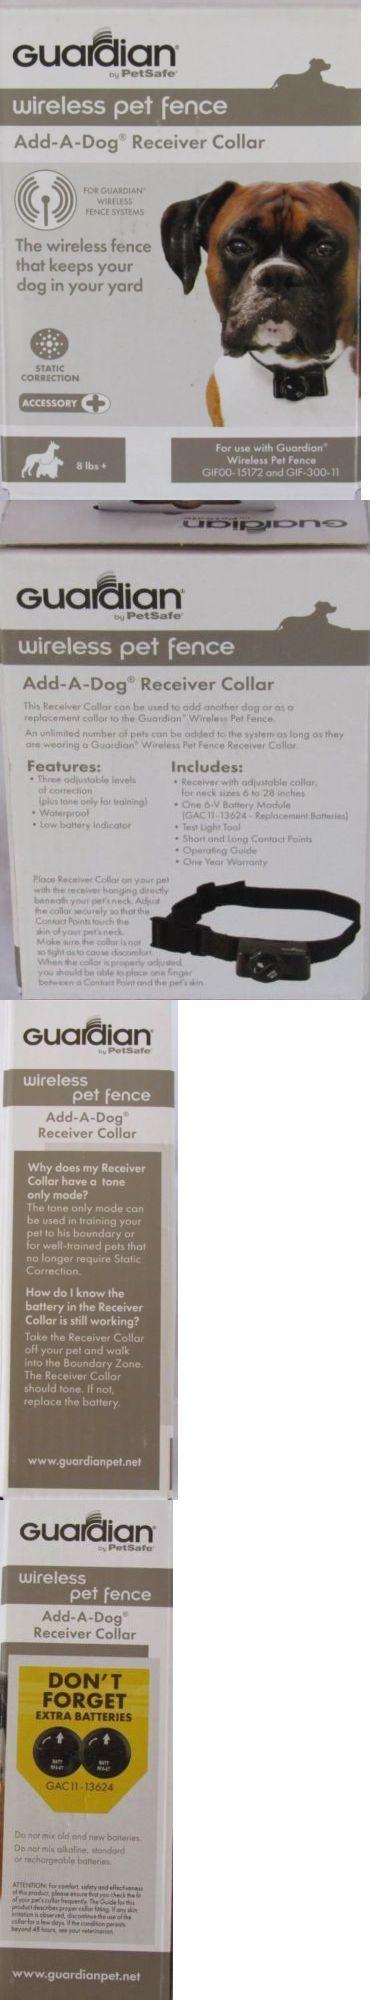 guardian pet fence